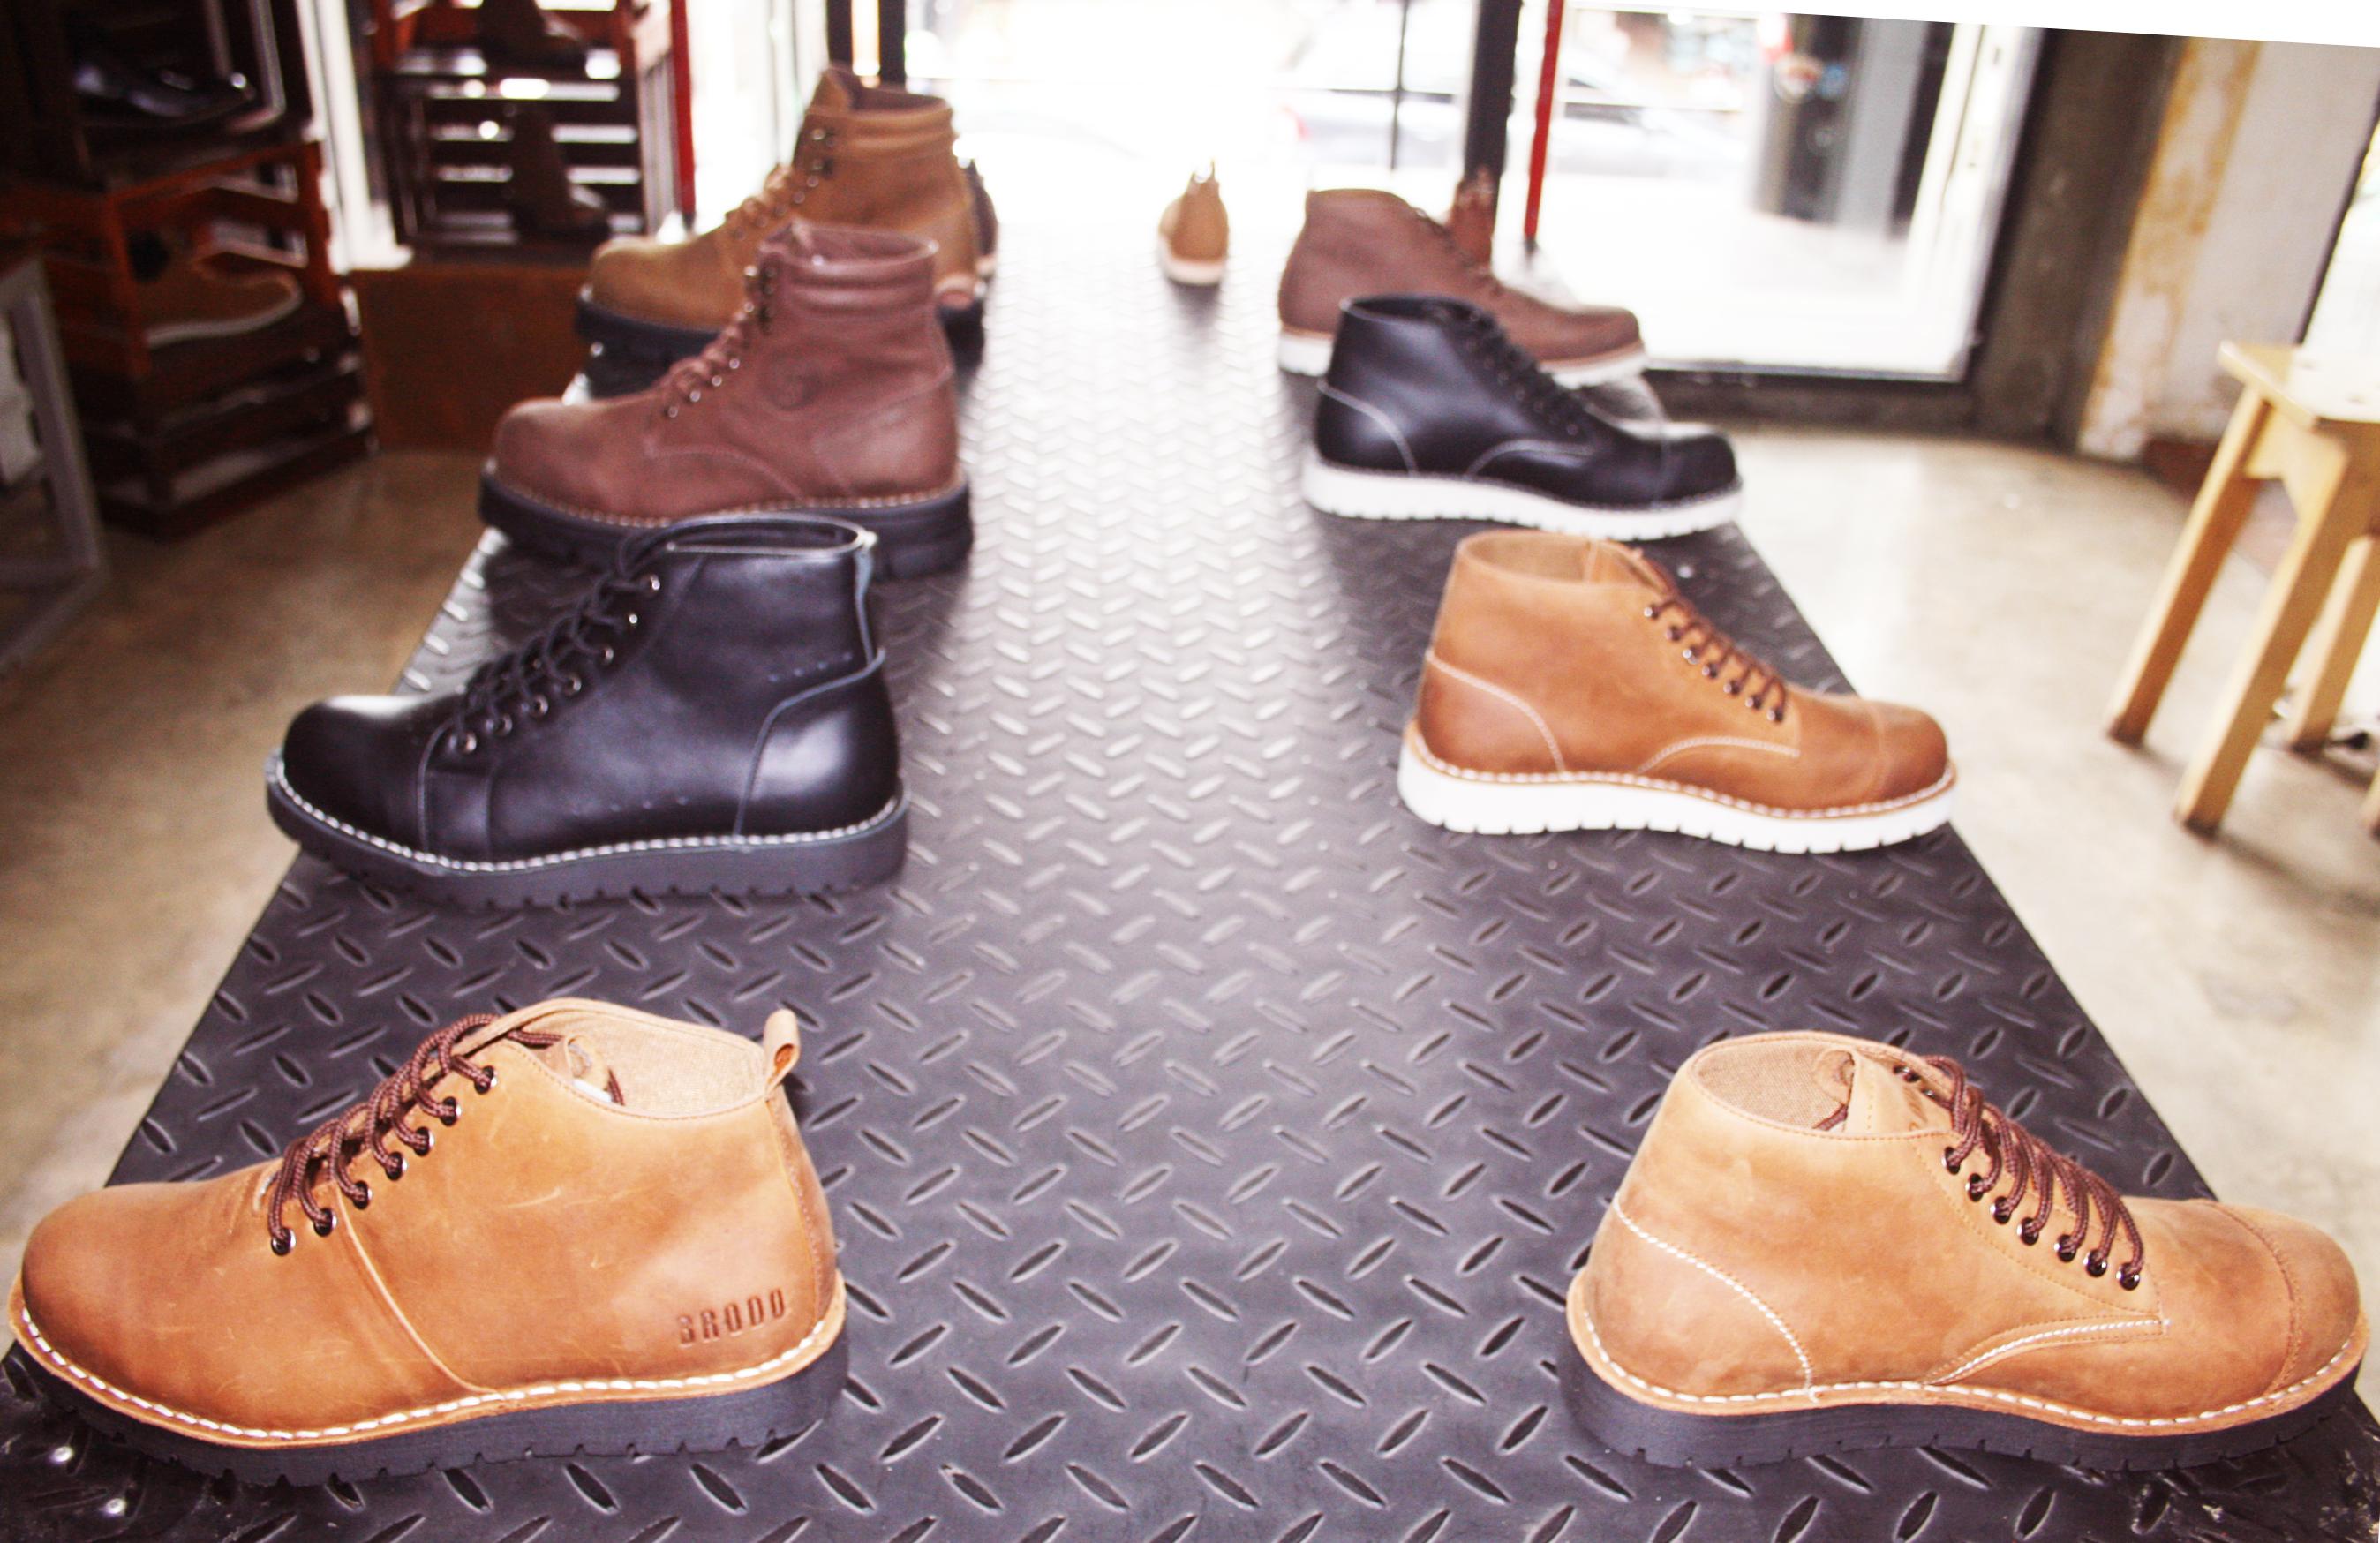 Foto: Brodo Footwear/Dok: indotrading.com